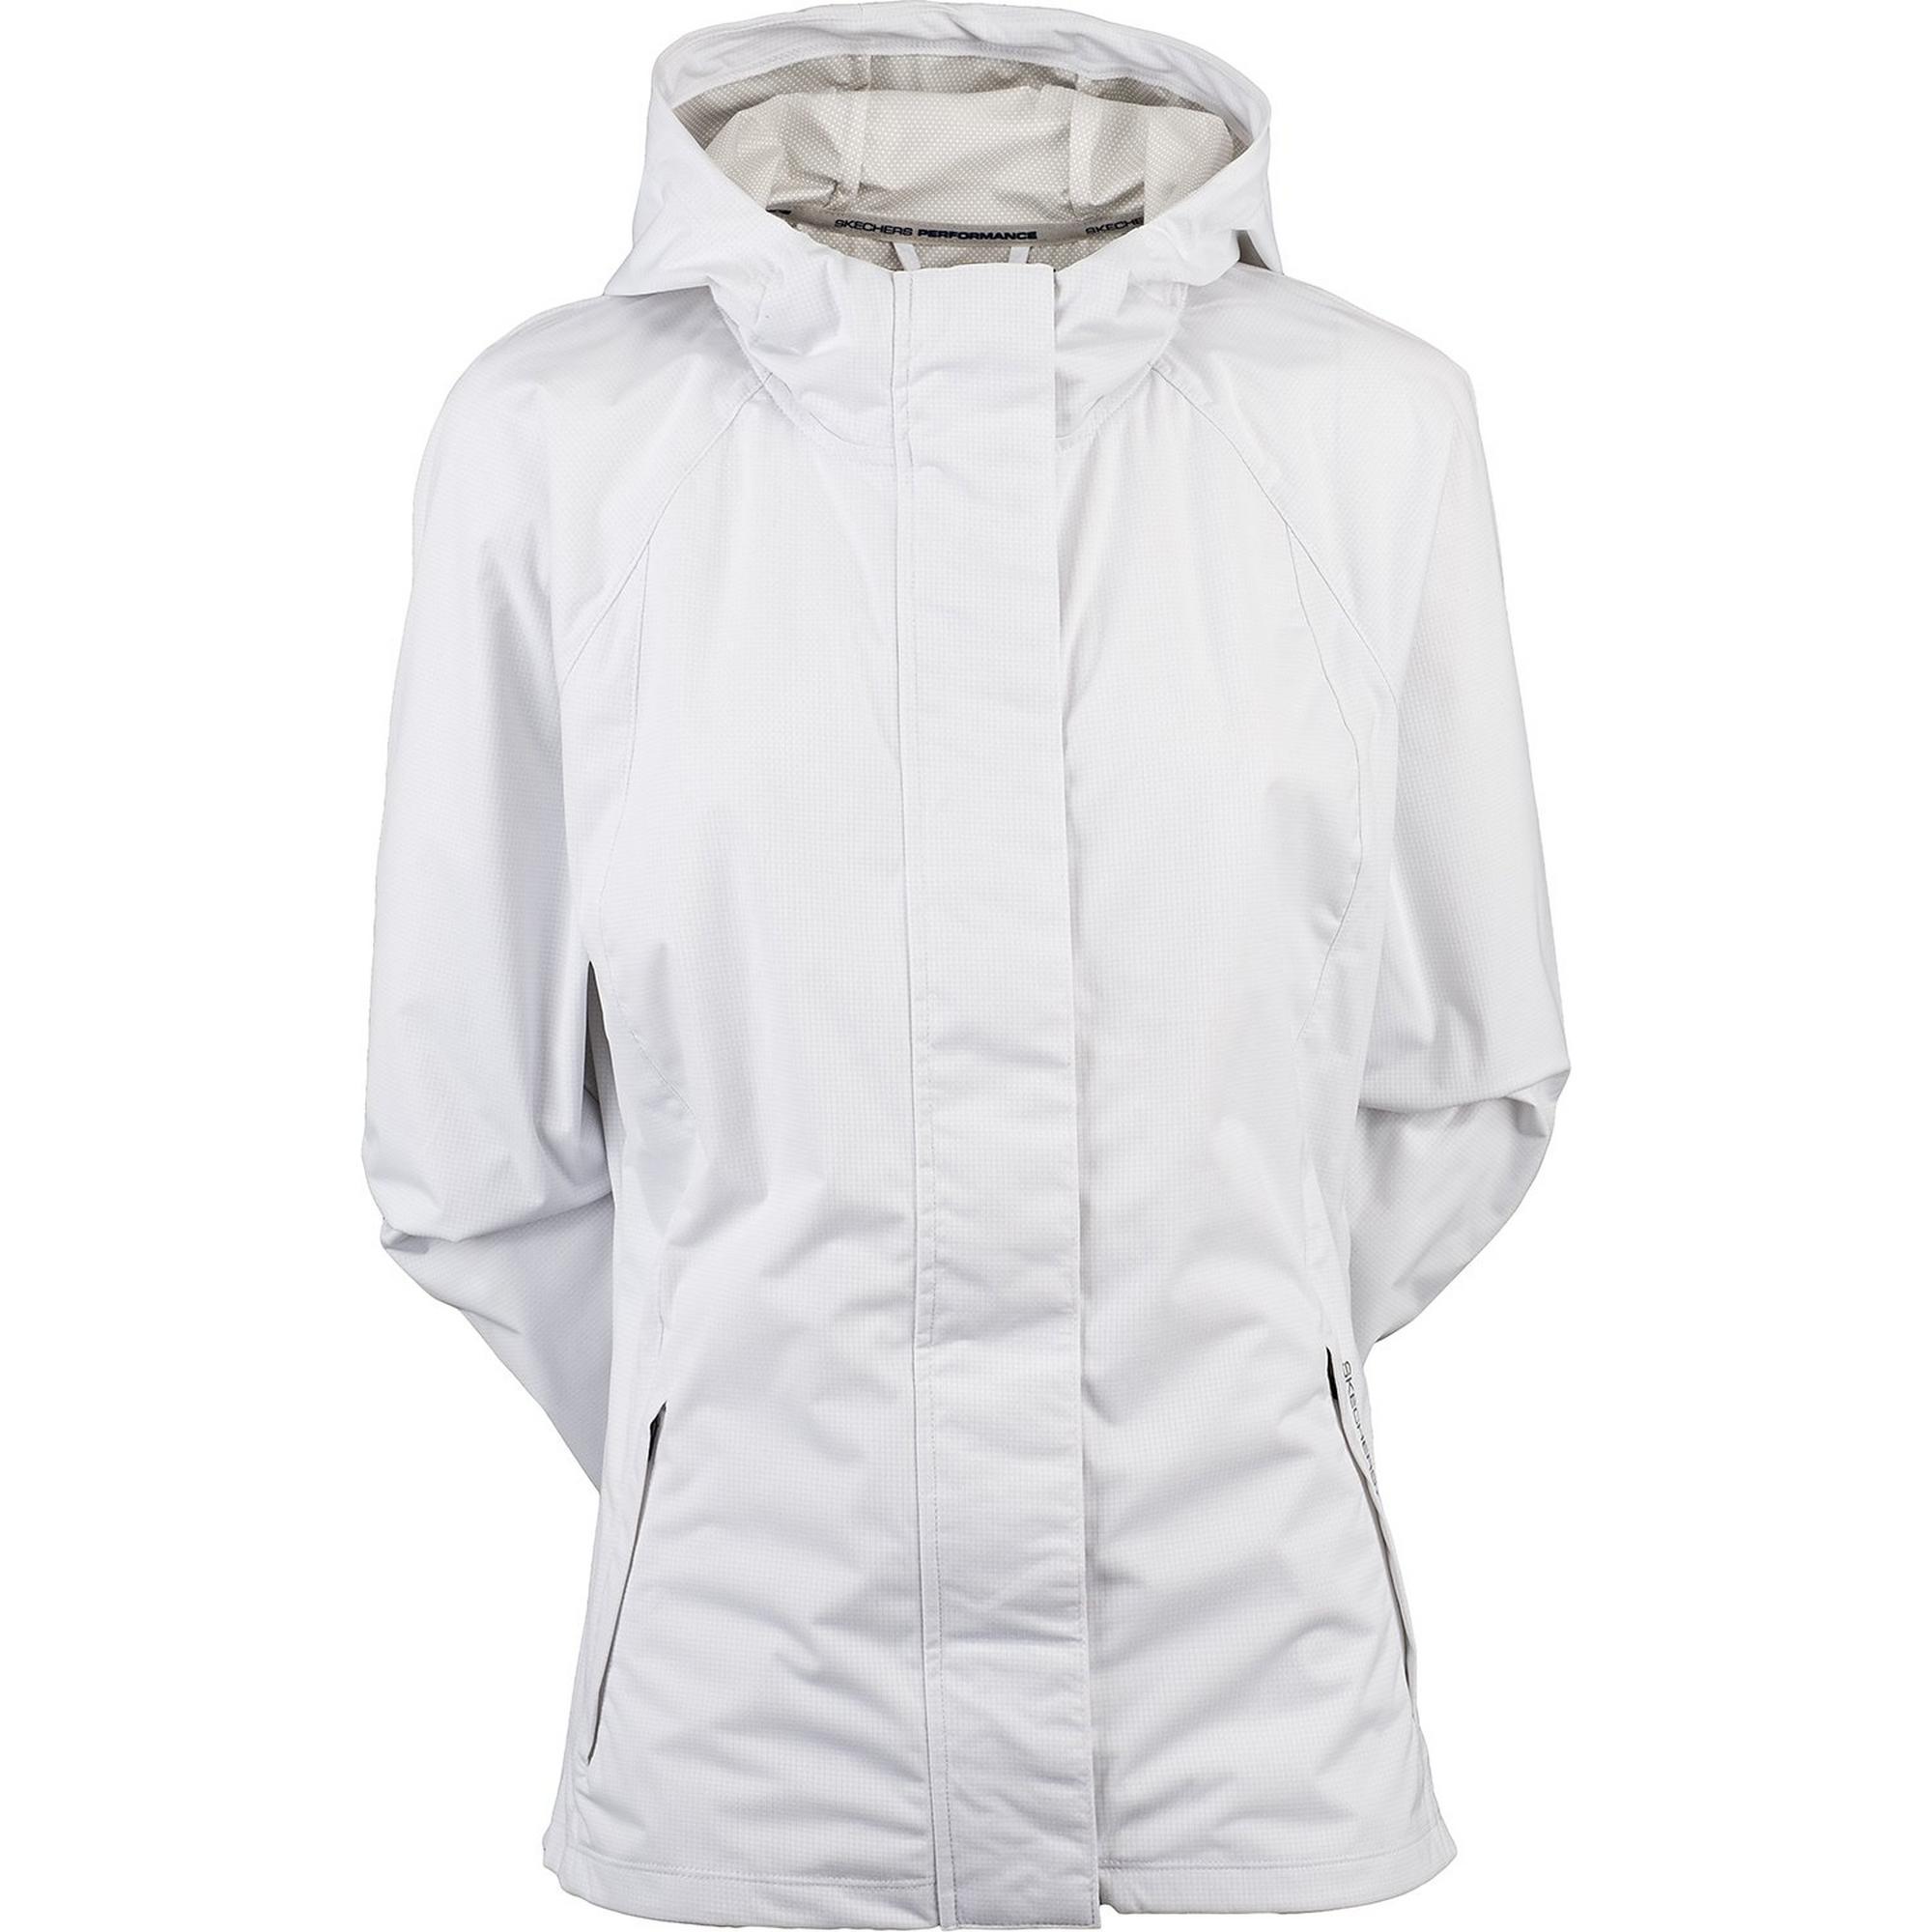 Women's Go Shield Golf Rain Jacket